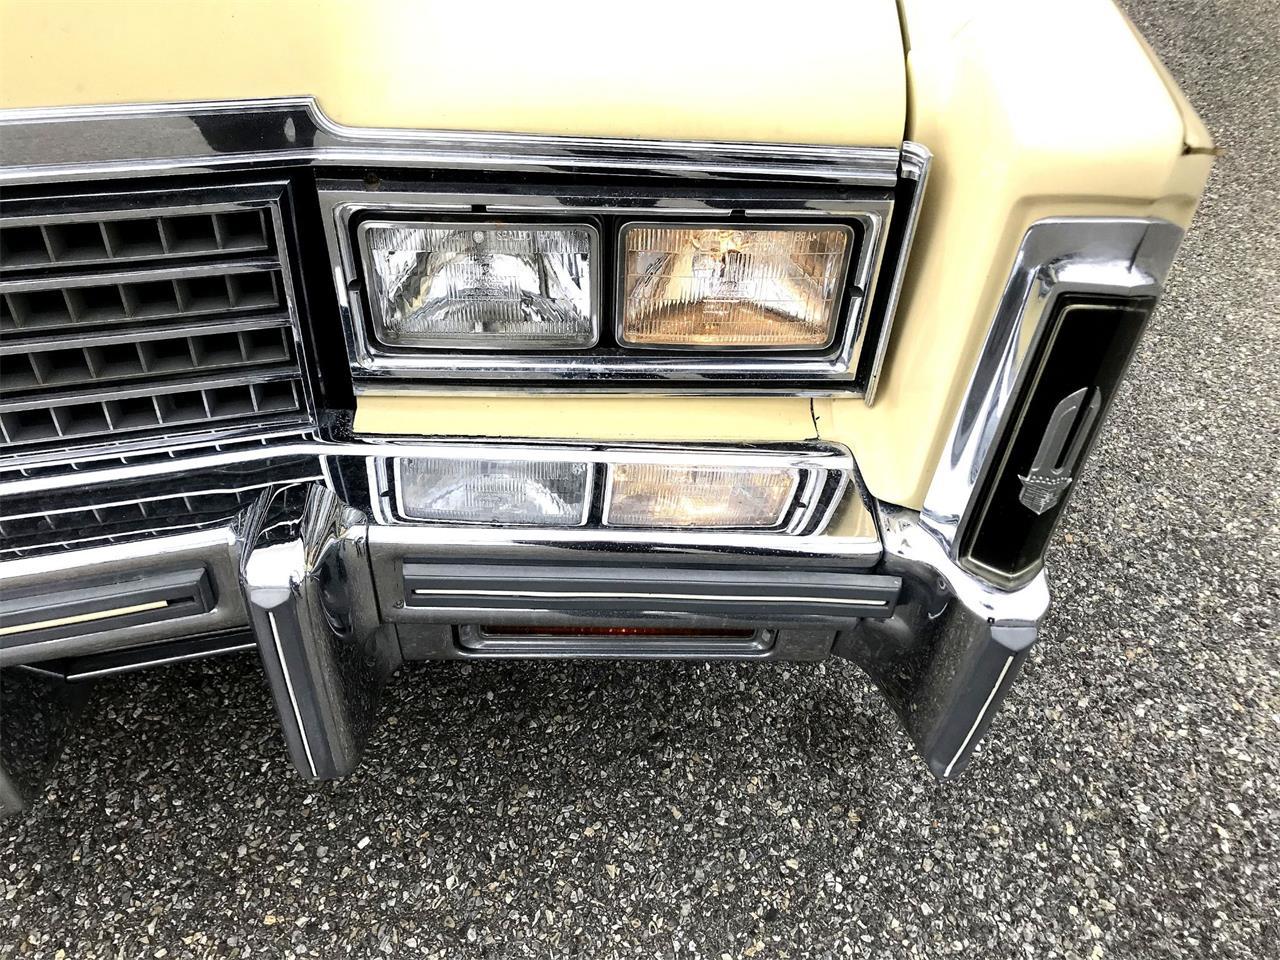 1978 Cadillac Eldorado Biarritz (CC-1337810) for sale in Stratford, New Jersey